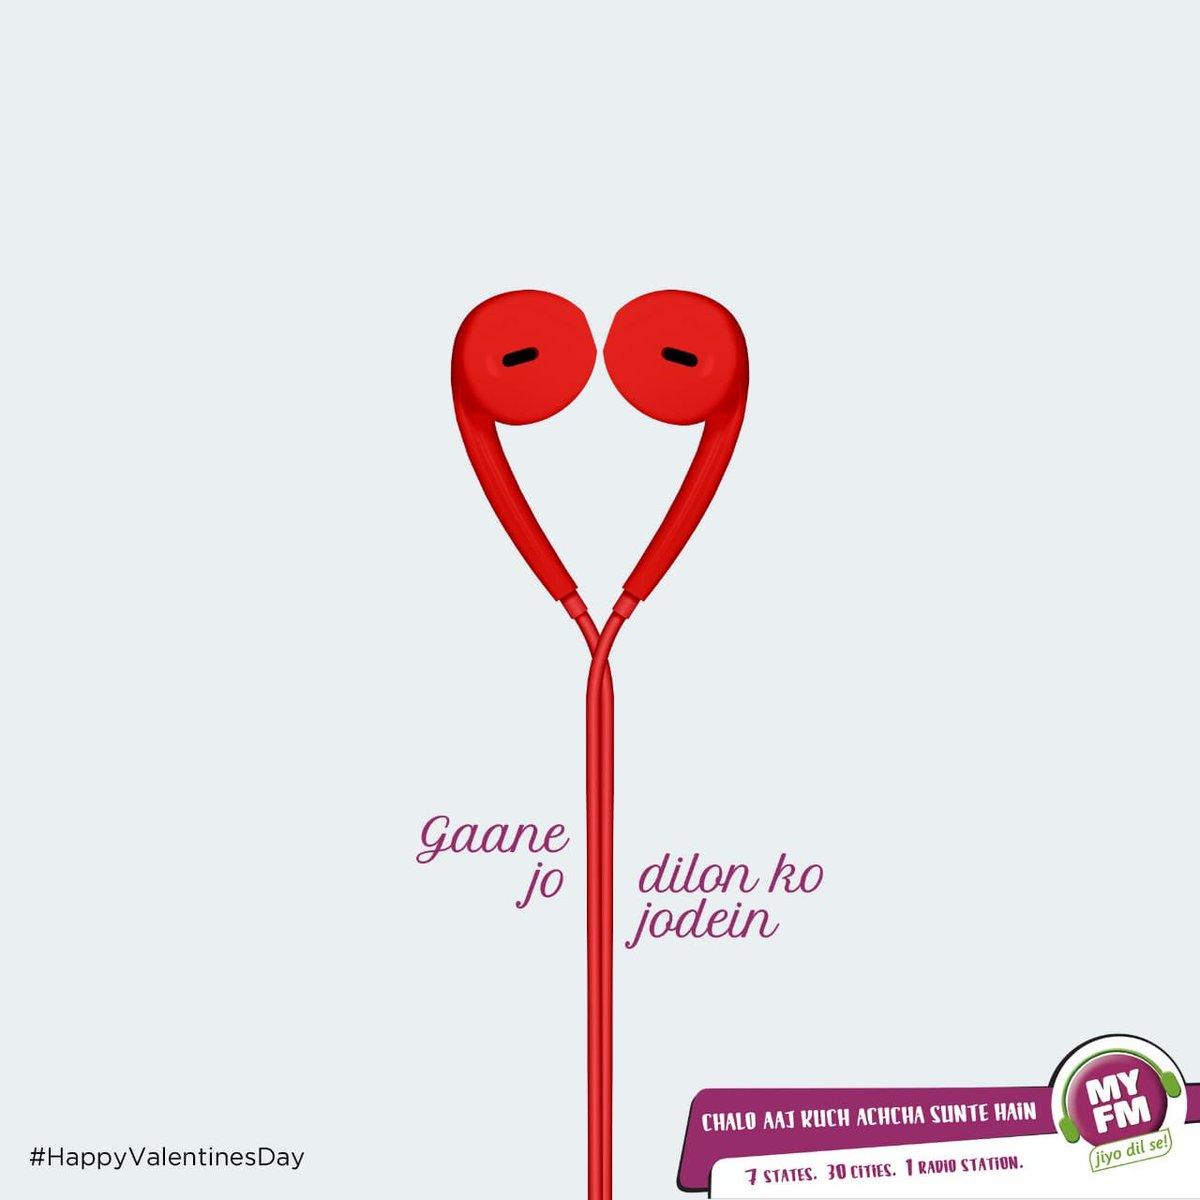 #Gaane jo Dilon ko jodein ! Celebrate #valentines musically with #MYFM #HappyValentineDay